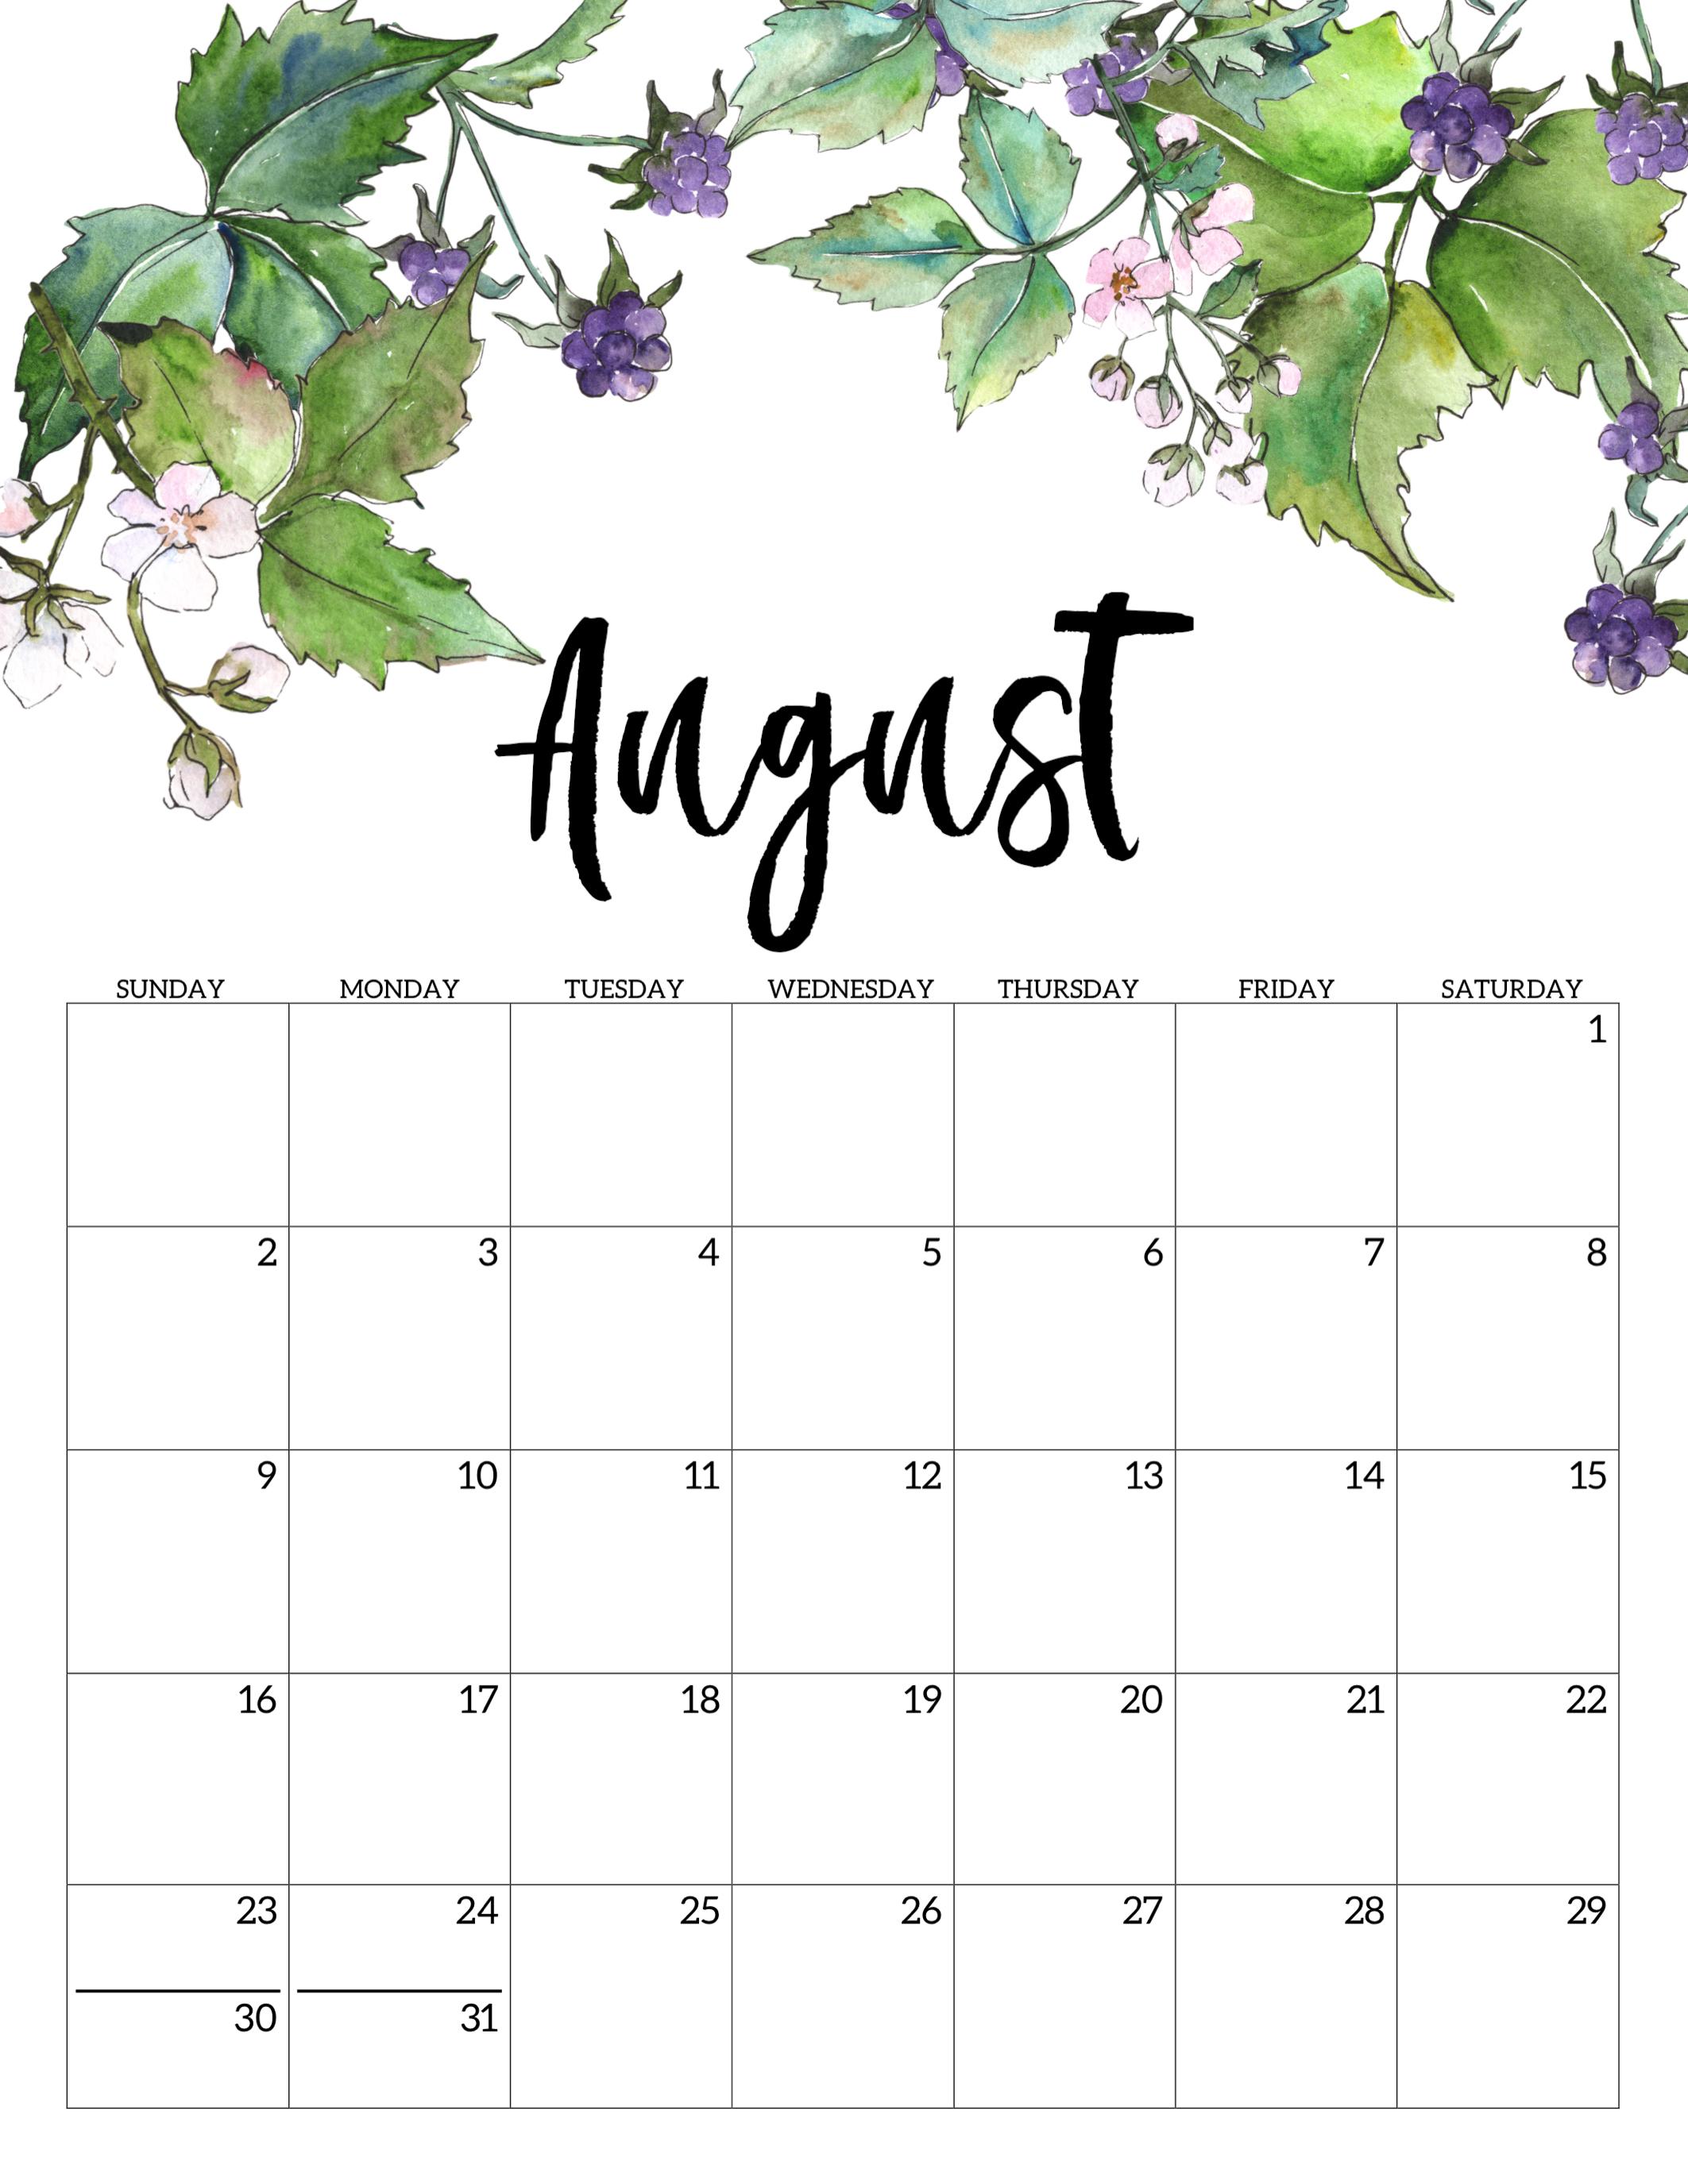 Calendar Of July 2020.2020 Free Printable Calendar Floral Paper Trail Design